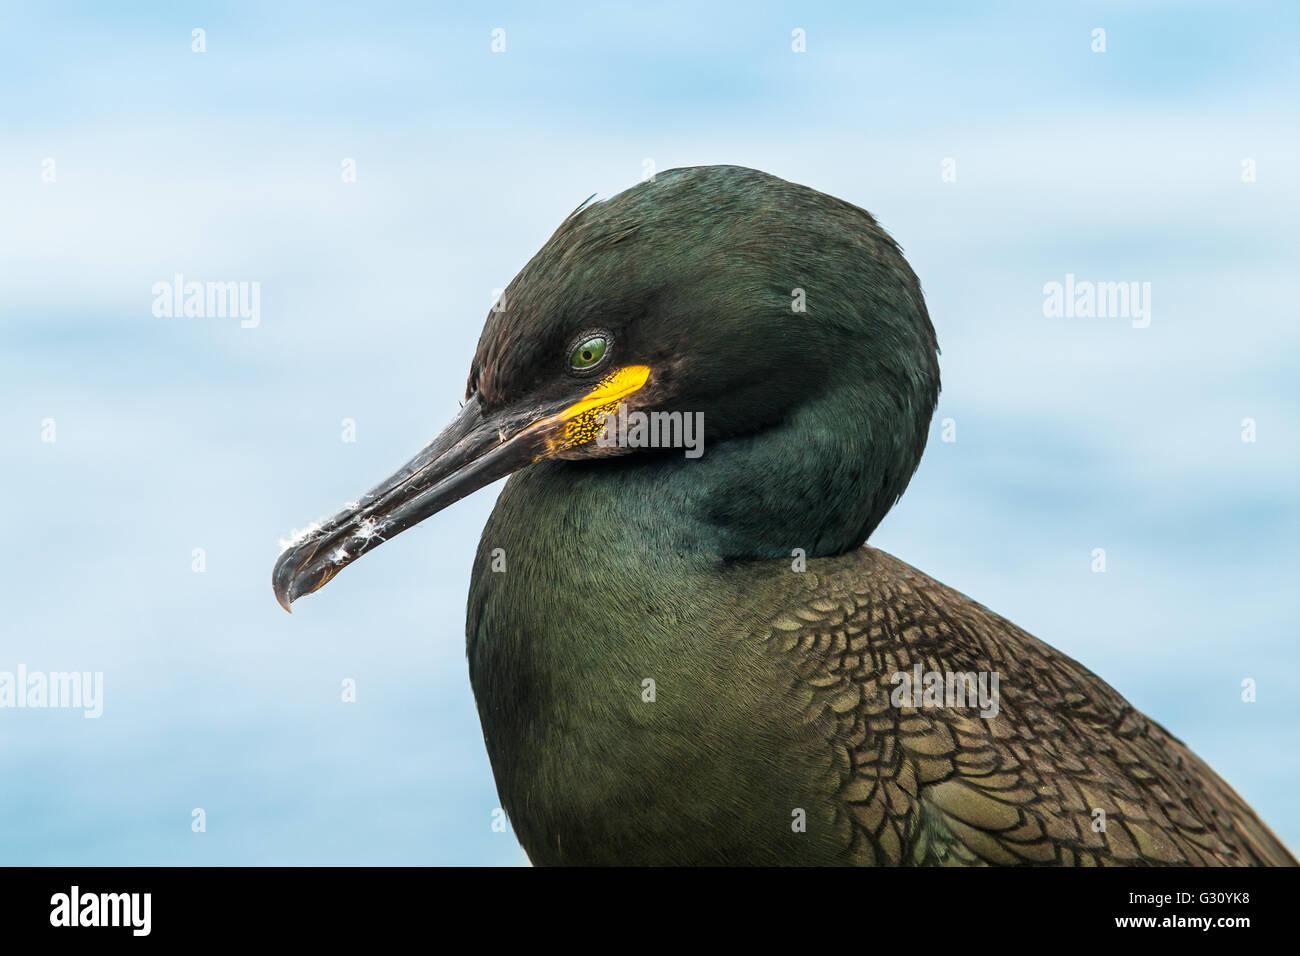 Shag (Phalacrocorax aristotelis) - Stock Image